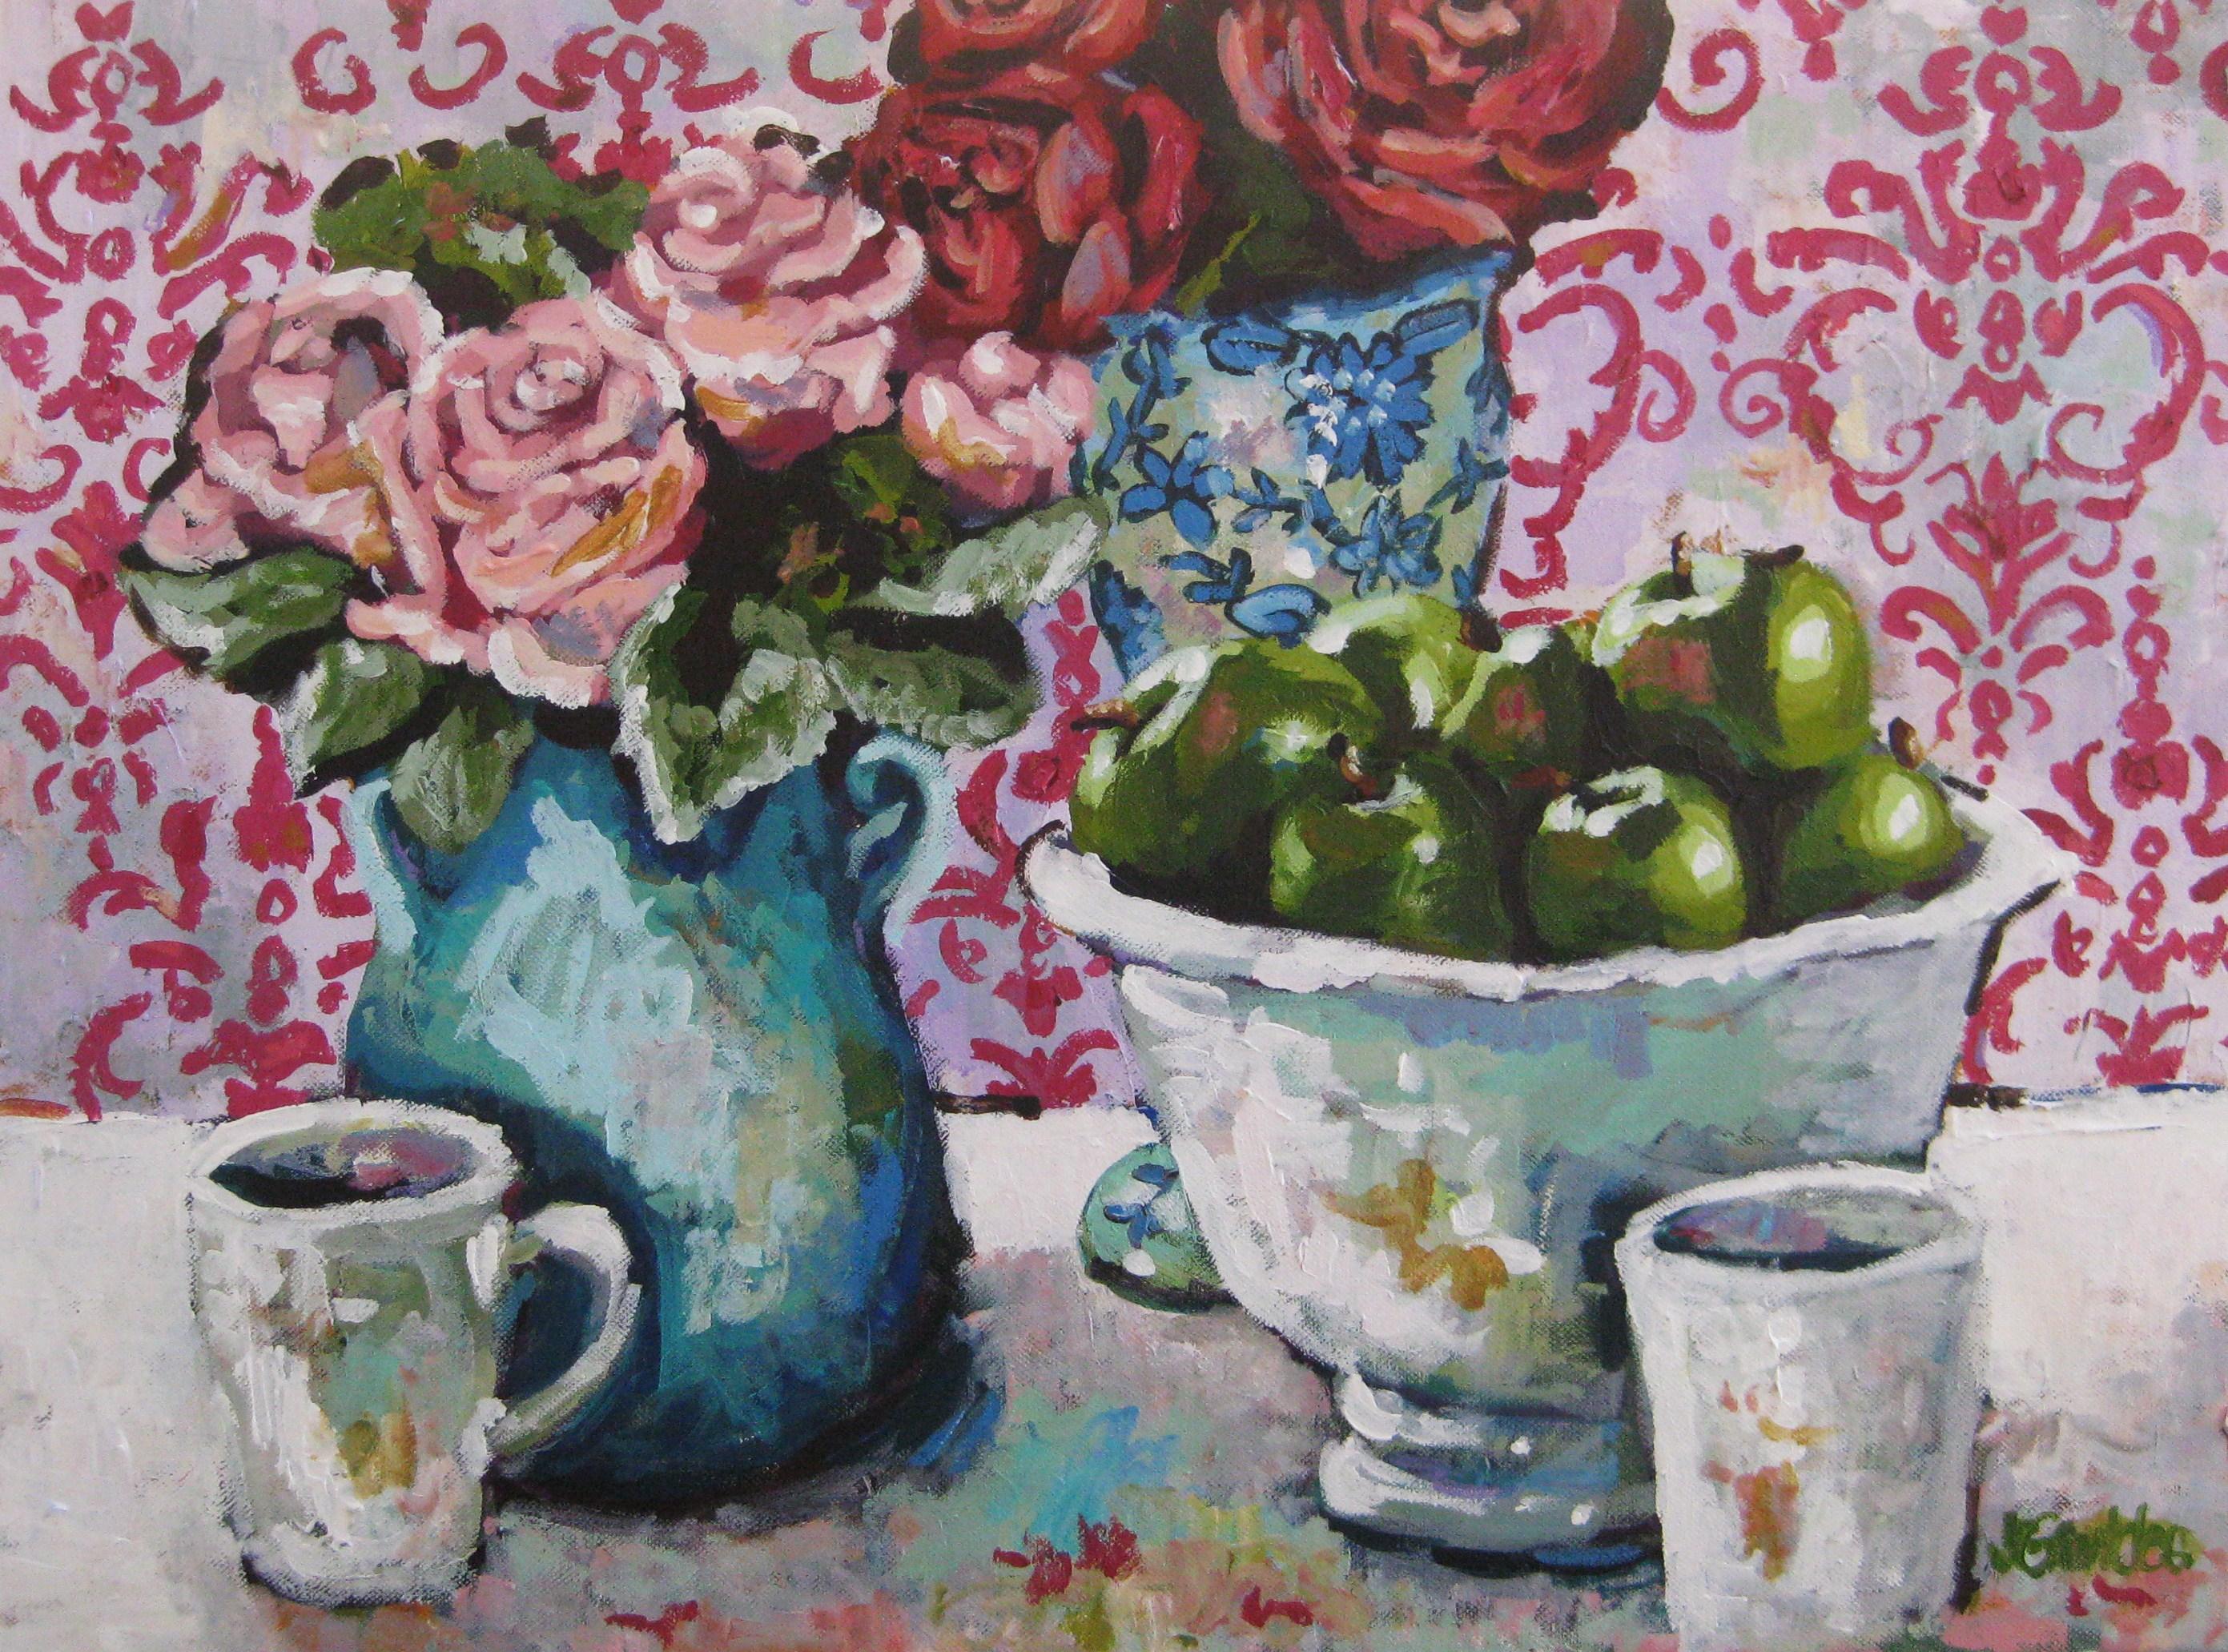 Pink Damask Floral 18x24